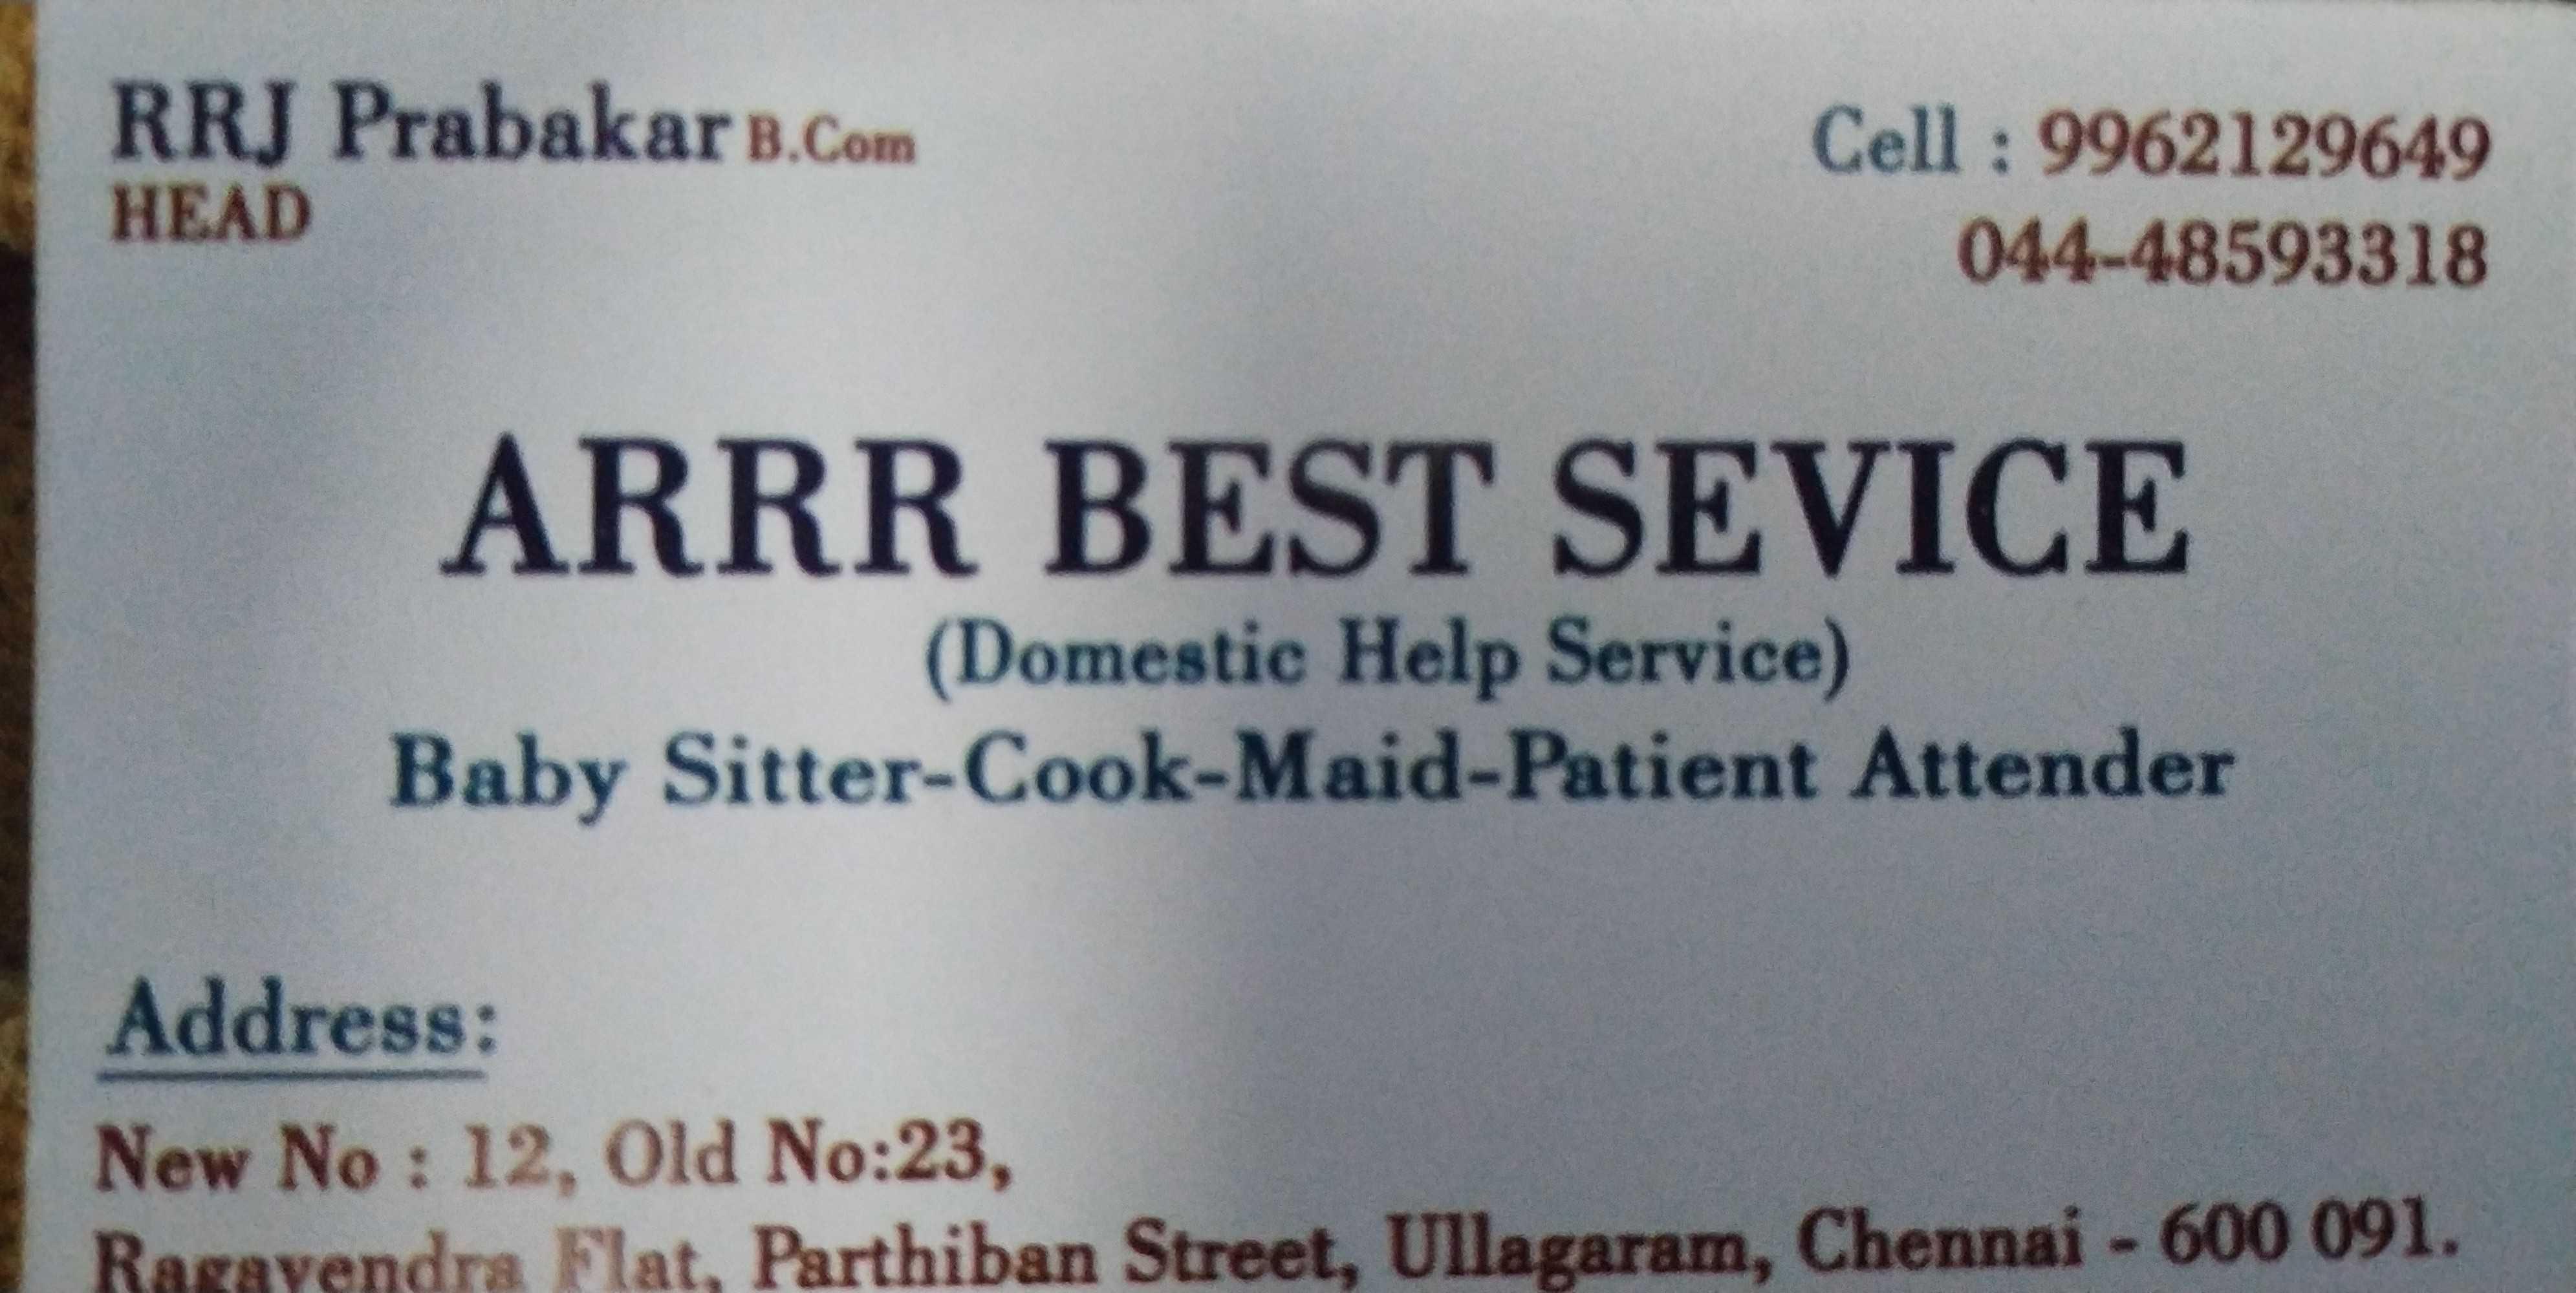 ARRR Best Service in Ullagaram, Chennai-600091 | Sulekha Chennai